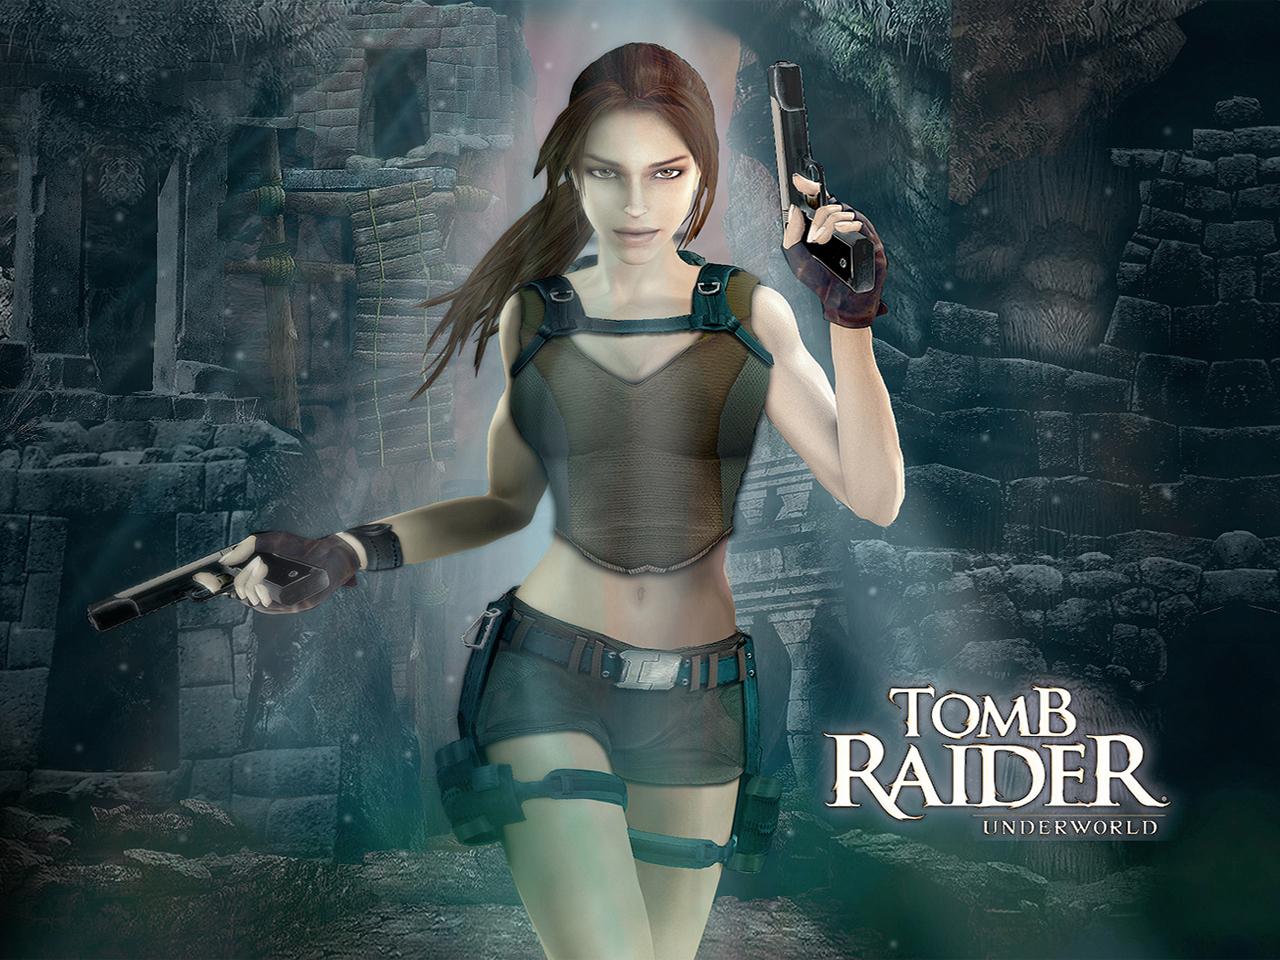 Tomb Raider Underworld Lara Croft Wallpaper Beautiful Small